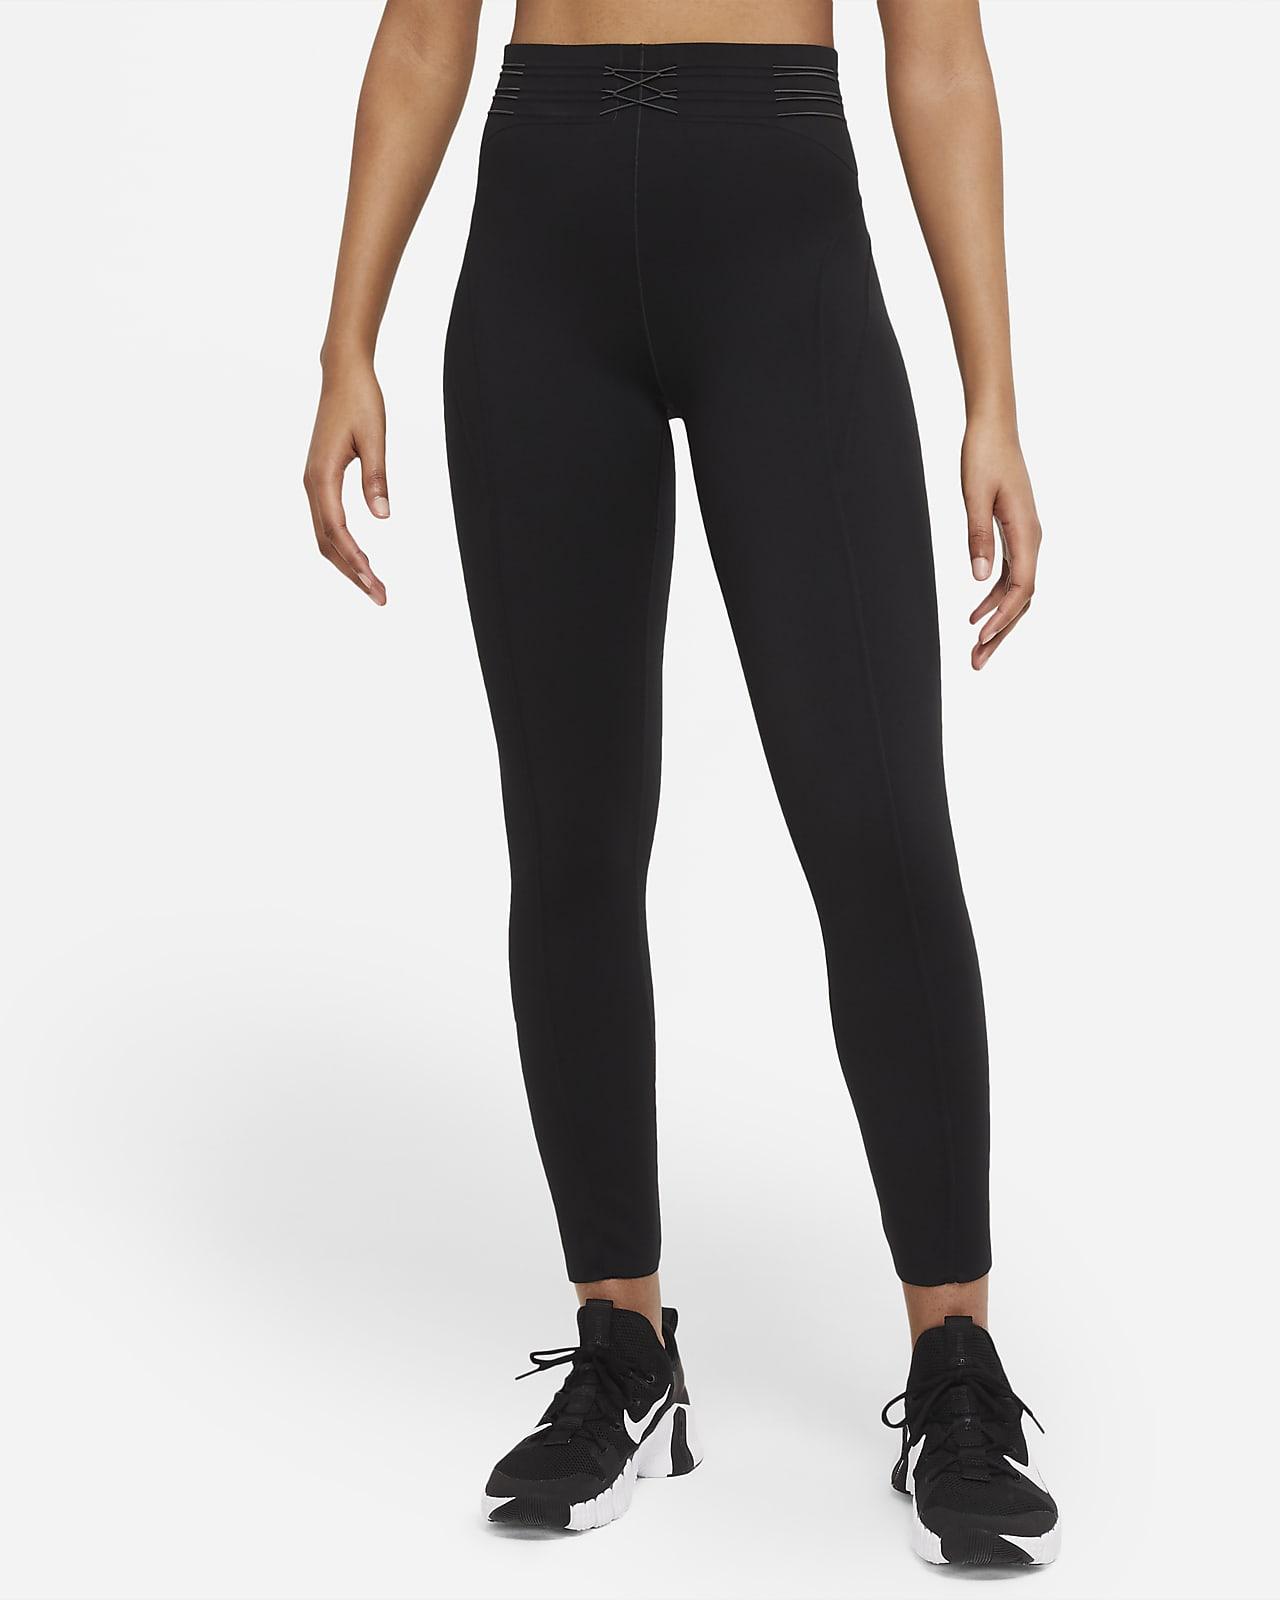 Nike City Ready Women's 7/8 Training Leggings